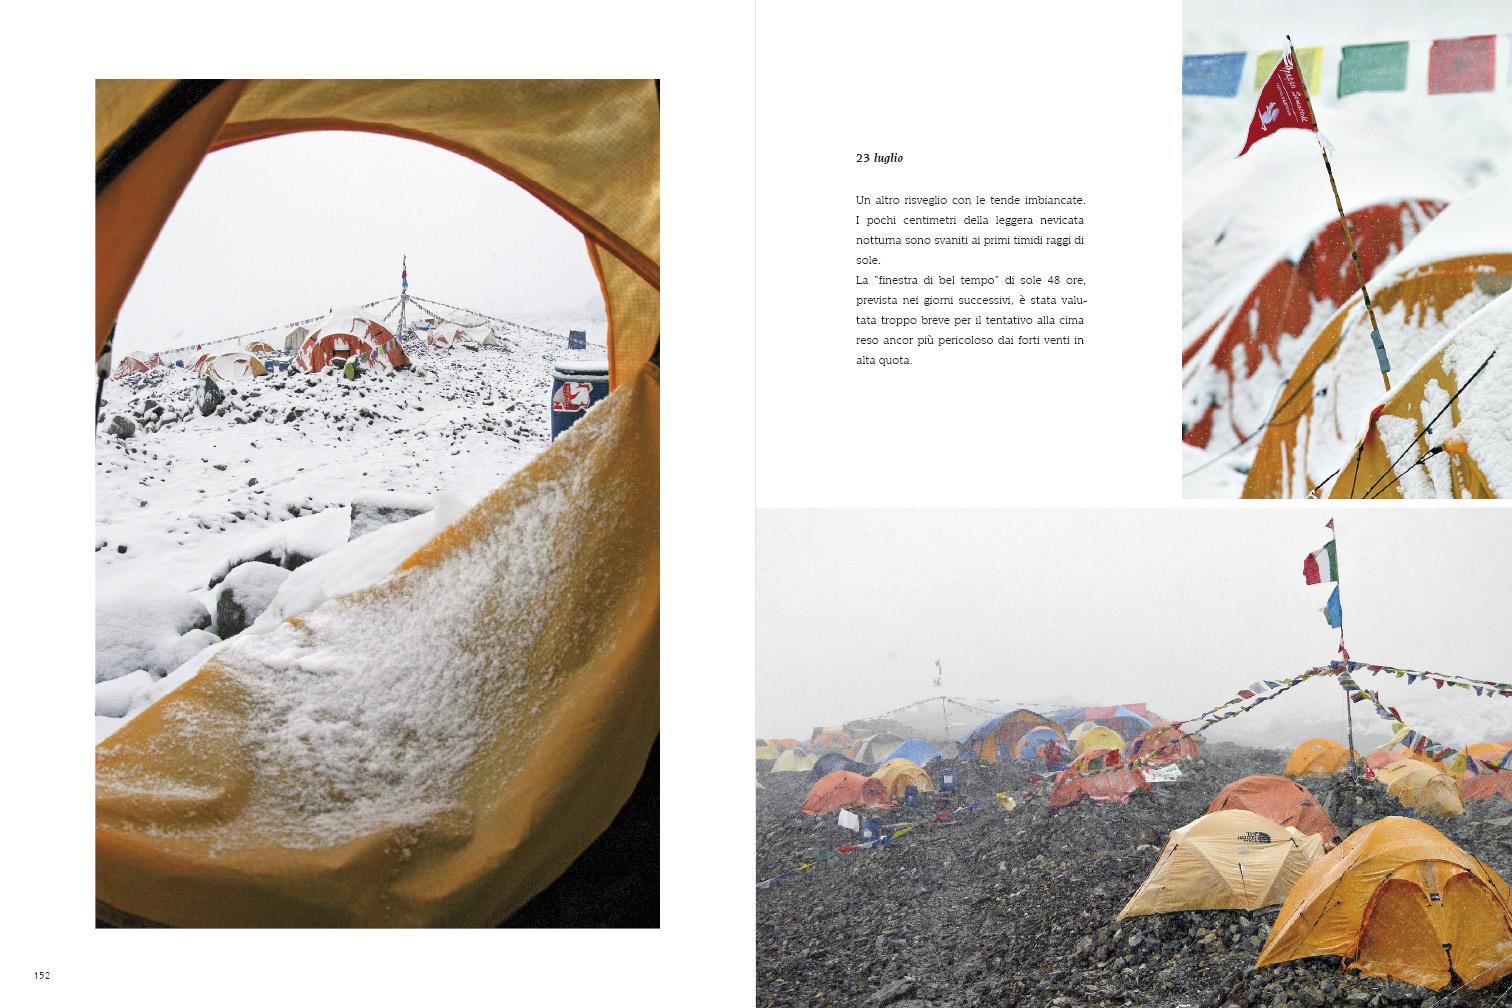 K2 EXPEDITION 1954-2004 Giuseppe Ghedina Fotografo - 078.jpg